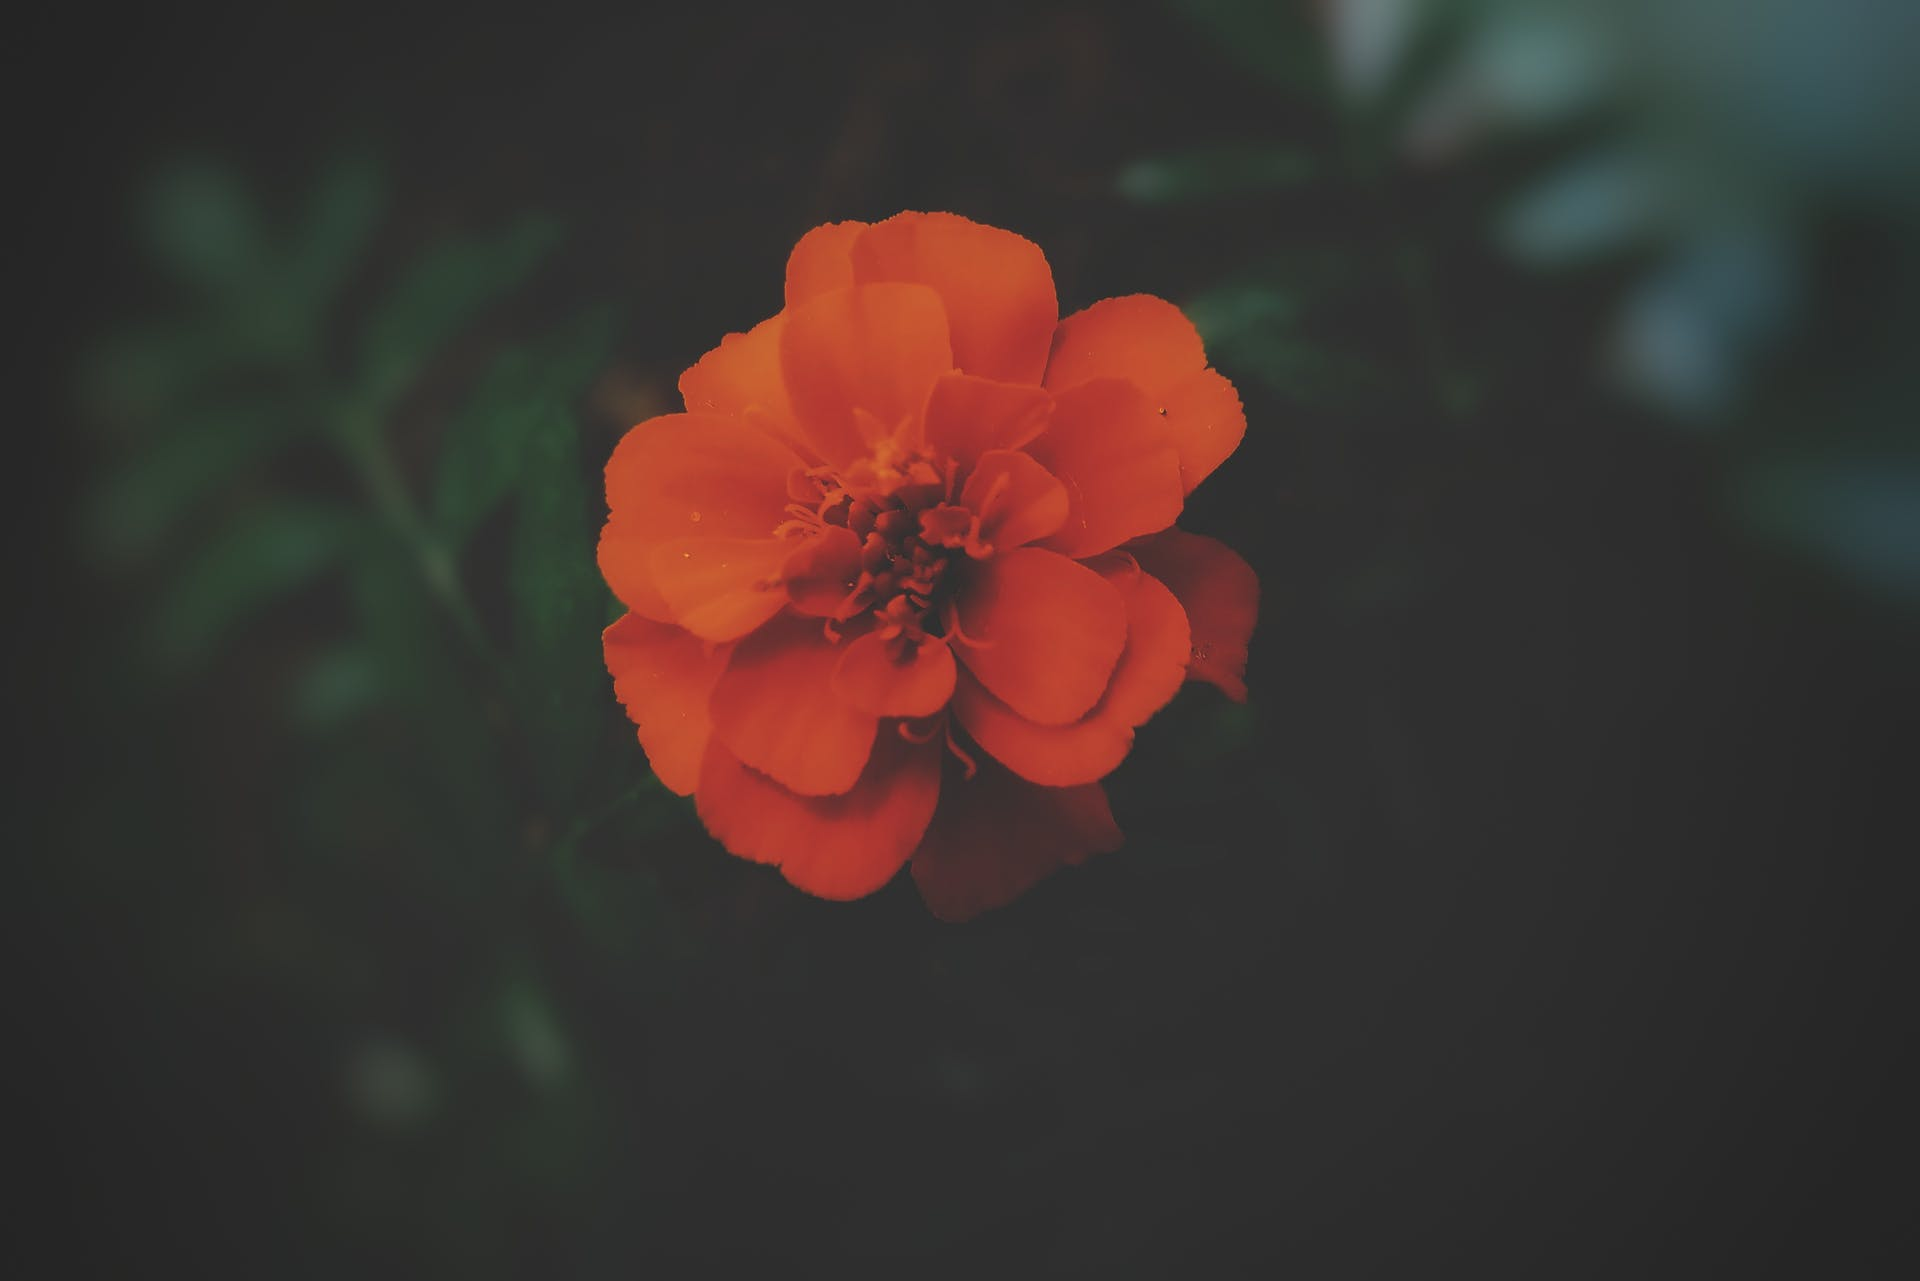 garden plant black background marigold hdr blurred hd wallpaper garden flower focus beautiful flowers blurred background